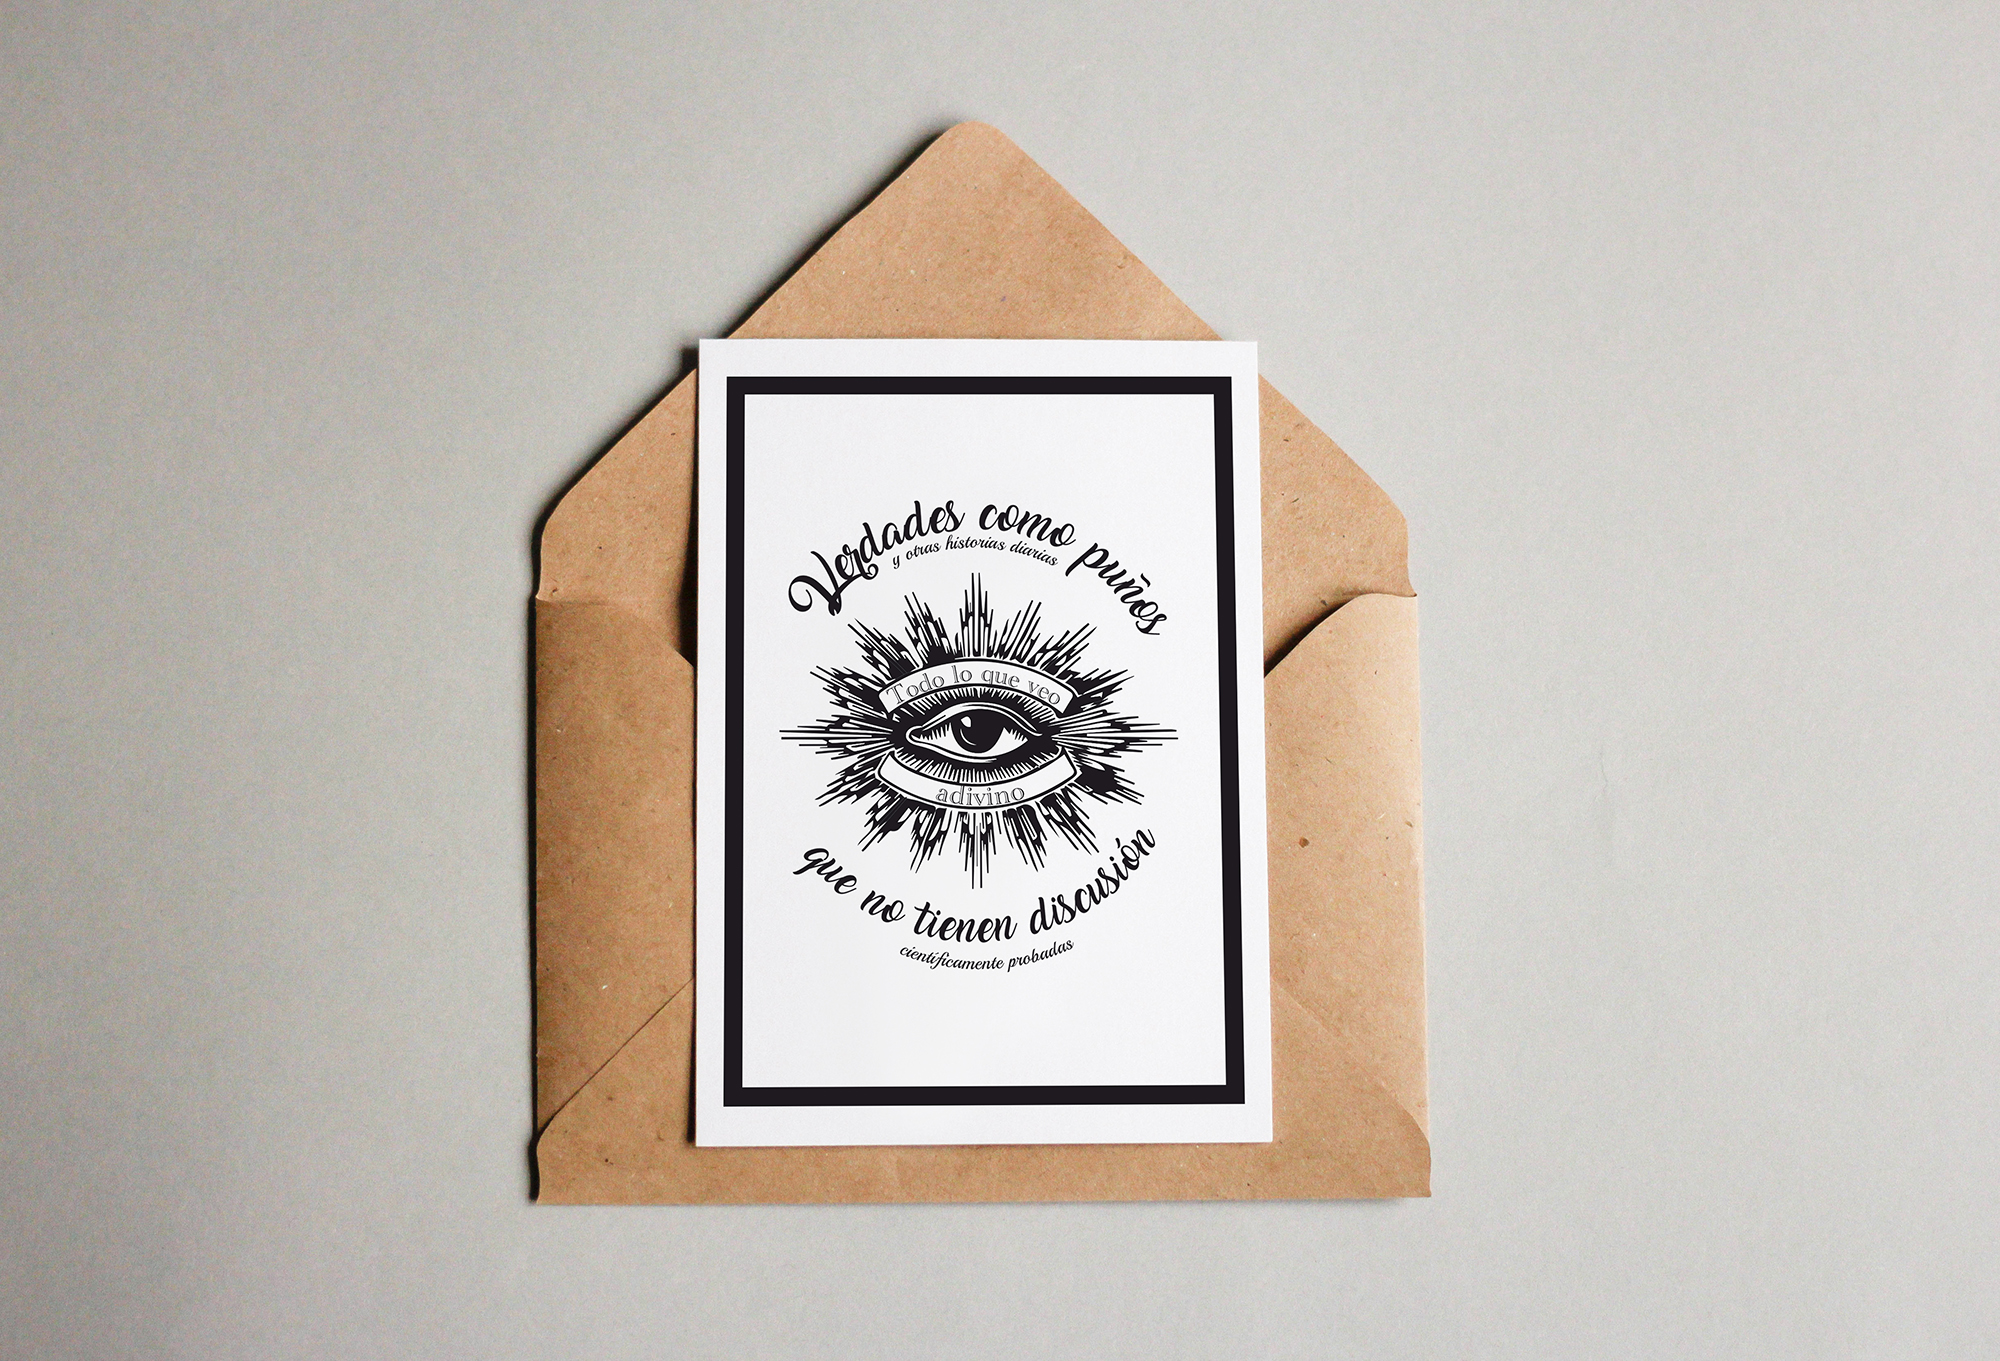 Verdades como puños  by Aidearte · estudio de diseño - Creative Work